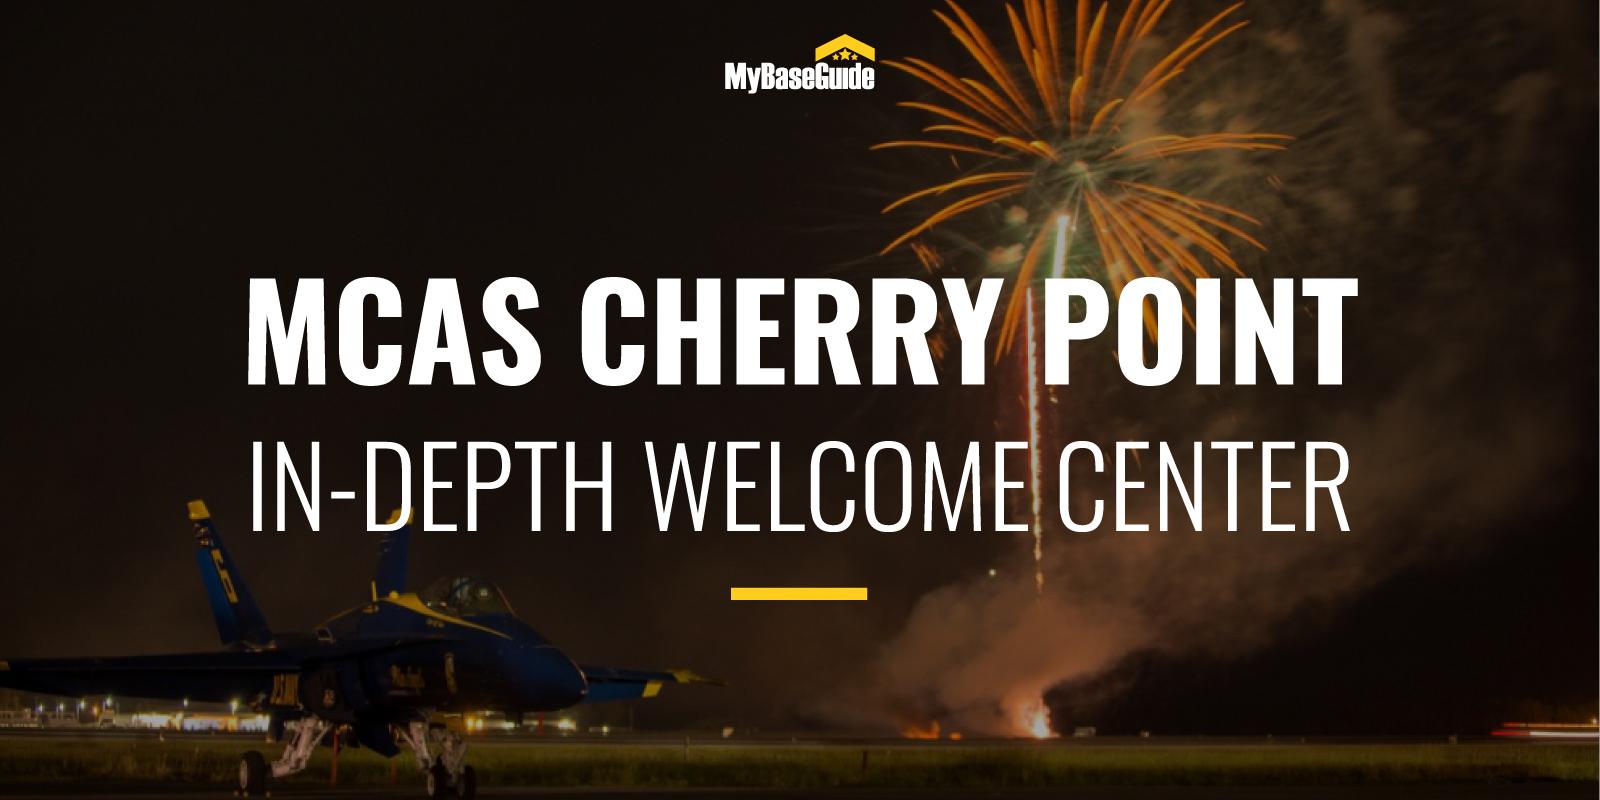 MCAS Cherry Point: In-Depth Welcome Center